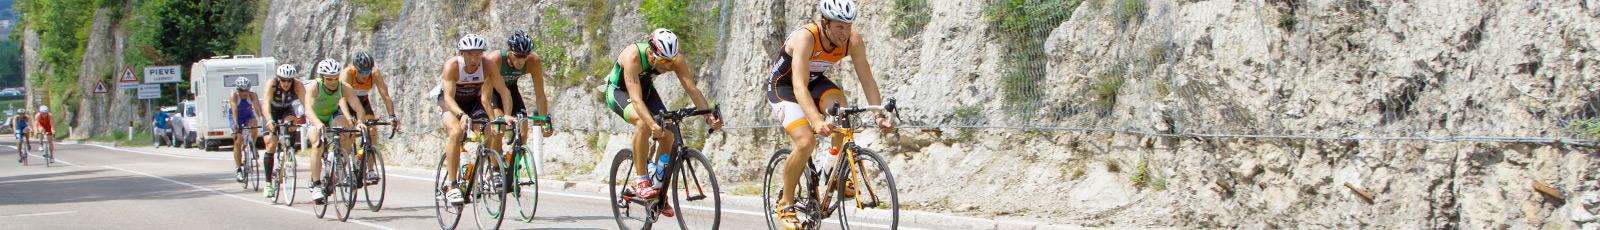 ciclismo-ledroman.jpg